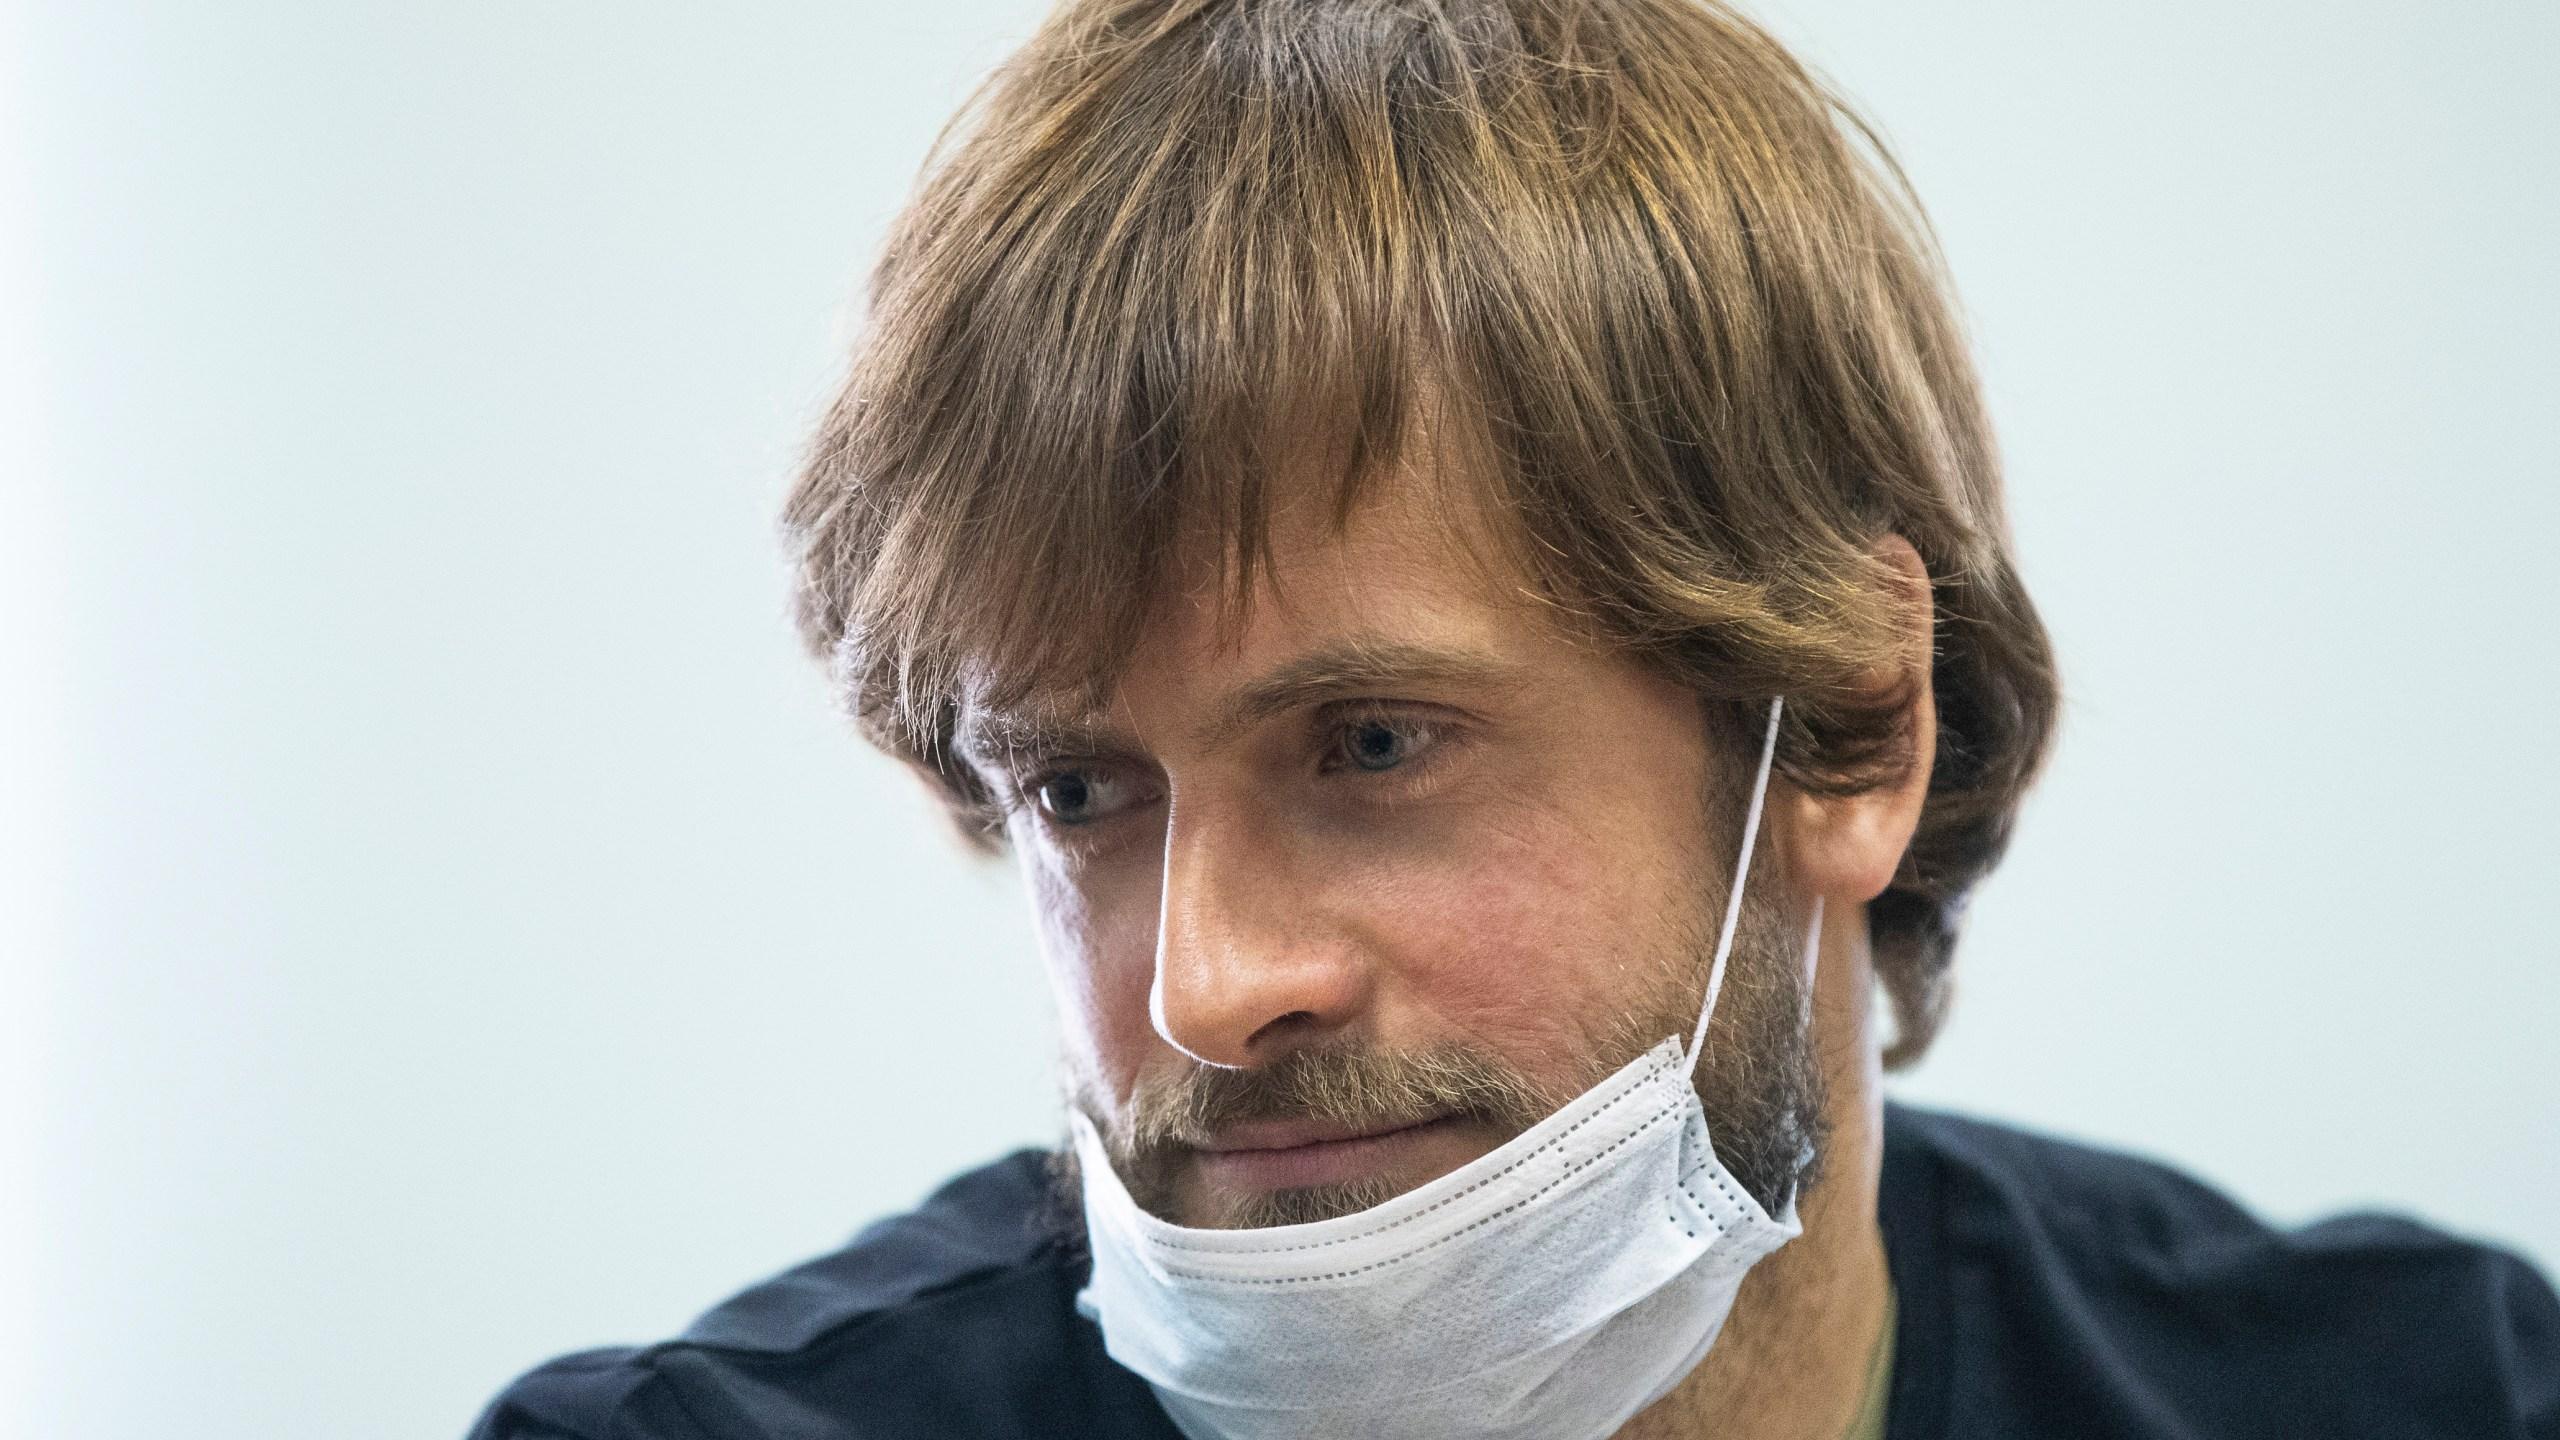 Pyotr Verzilov